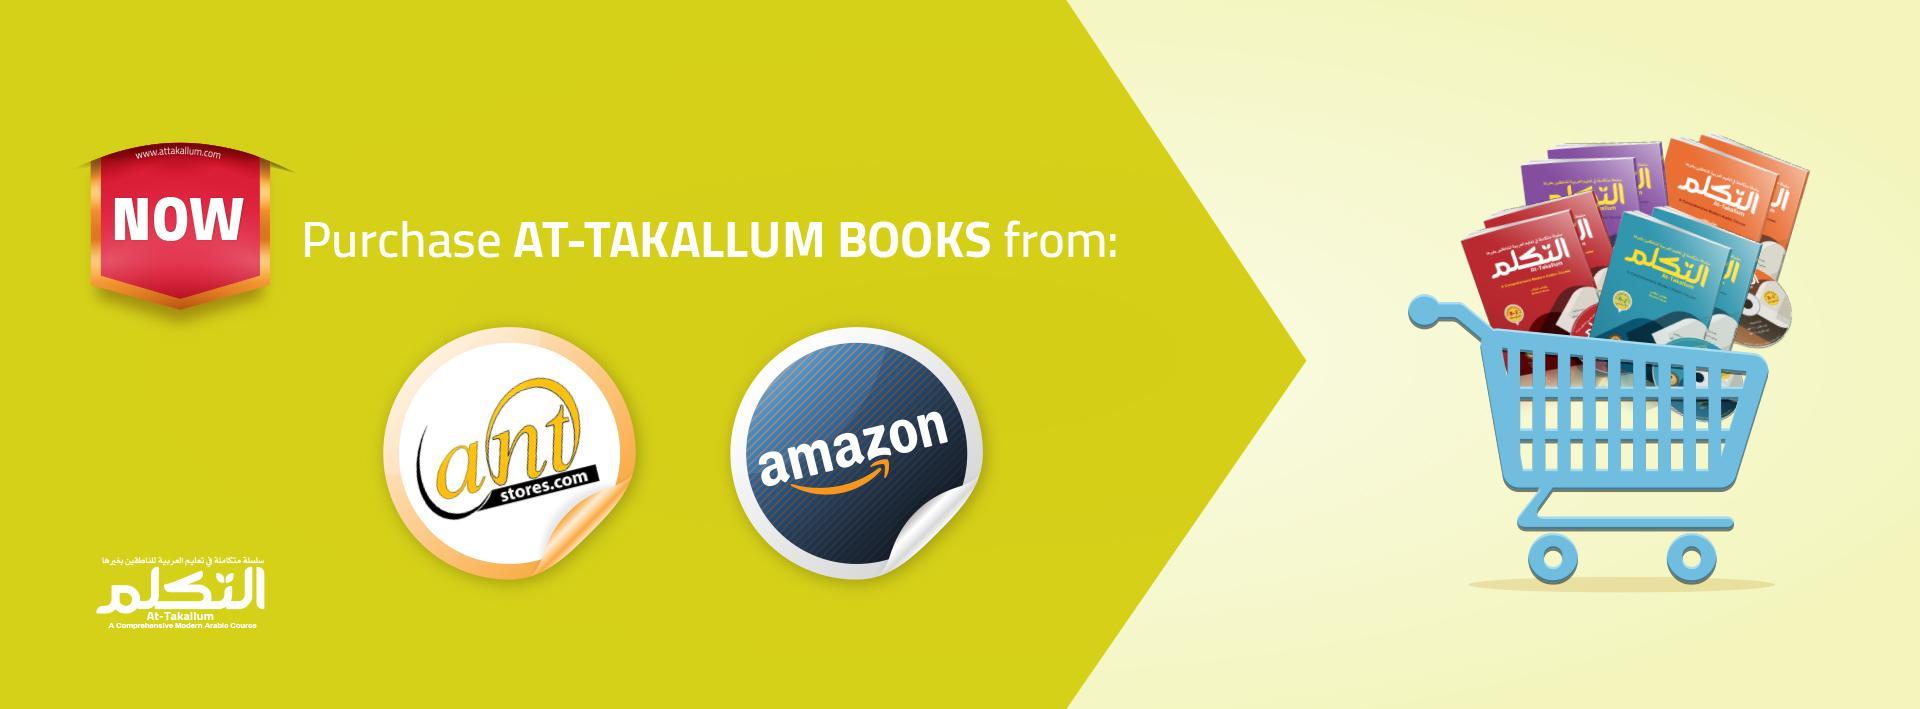 purchase At-takallum books